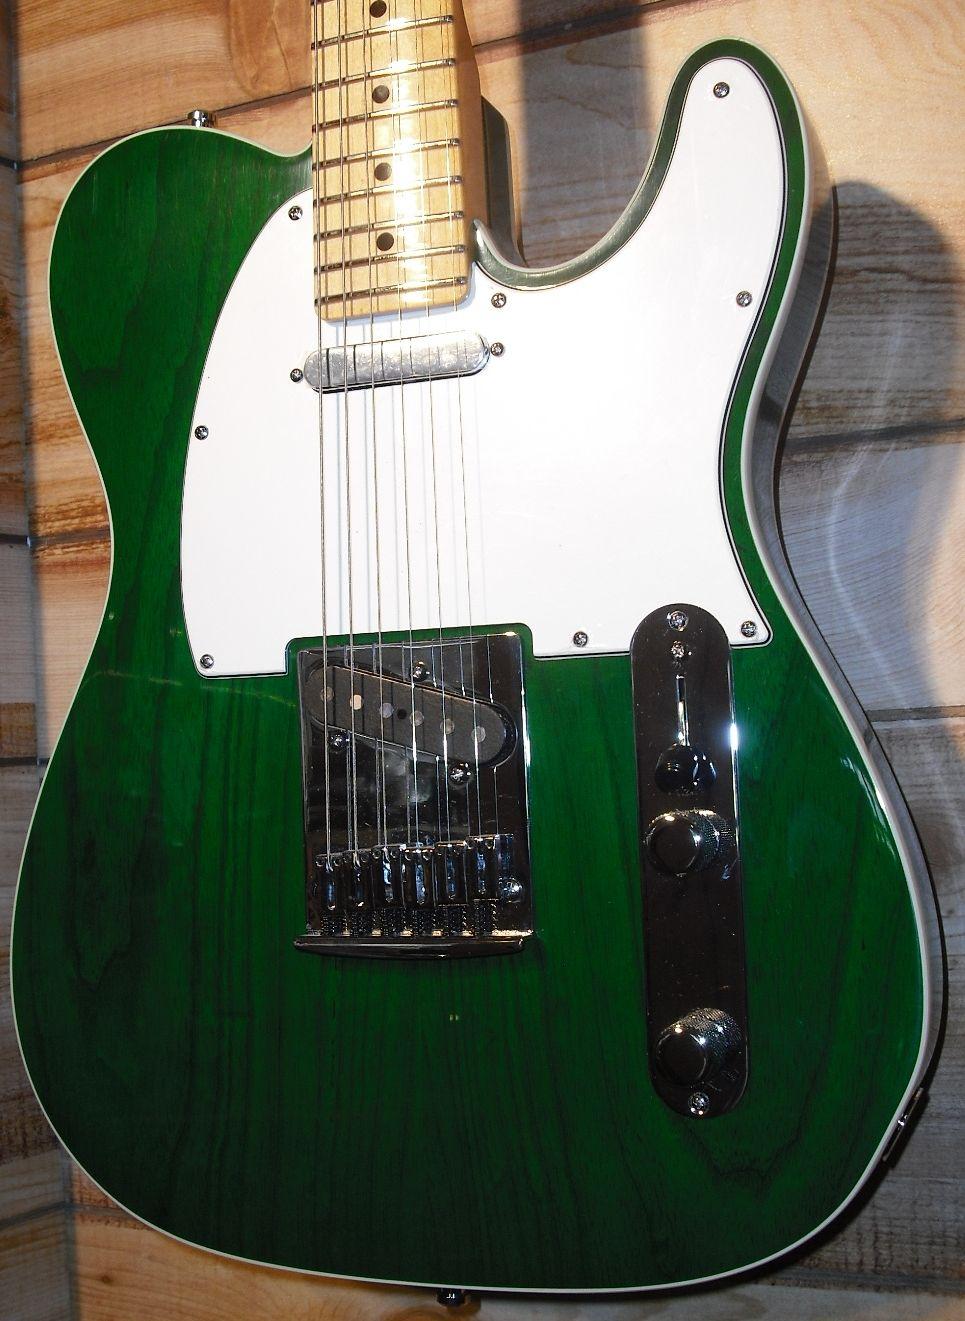 emerald green fender telecaster guitar guitars stratocaster guitar telecaster guitar guitar. Black Bedroom Furniture Sets. Home Design Ideas